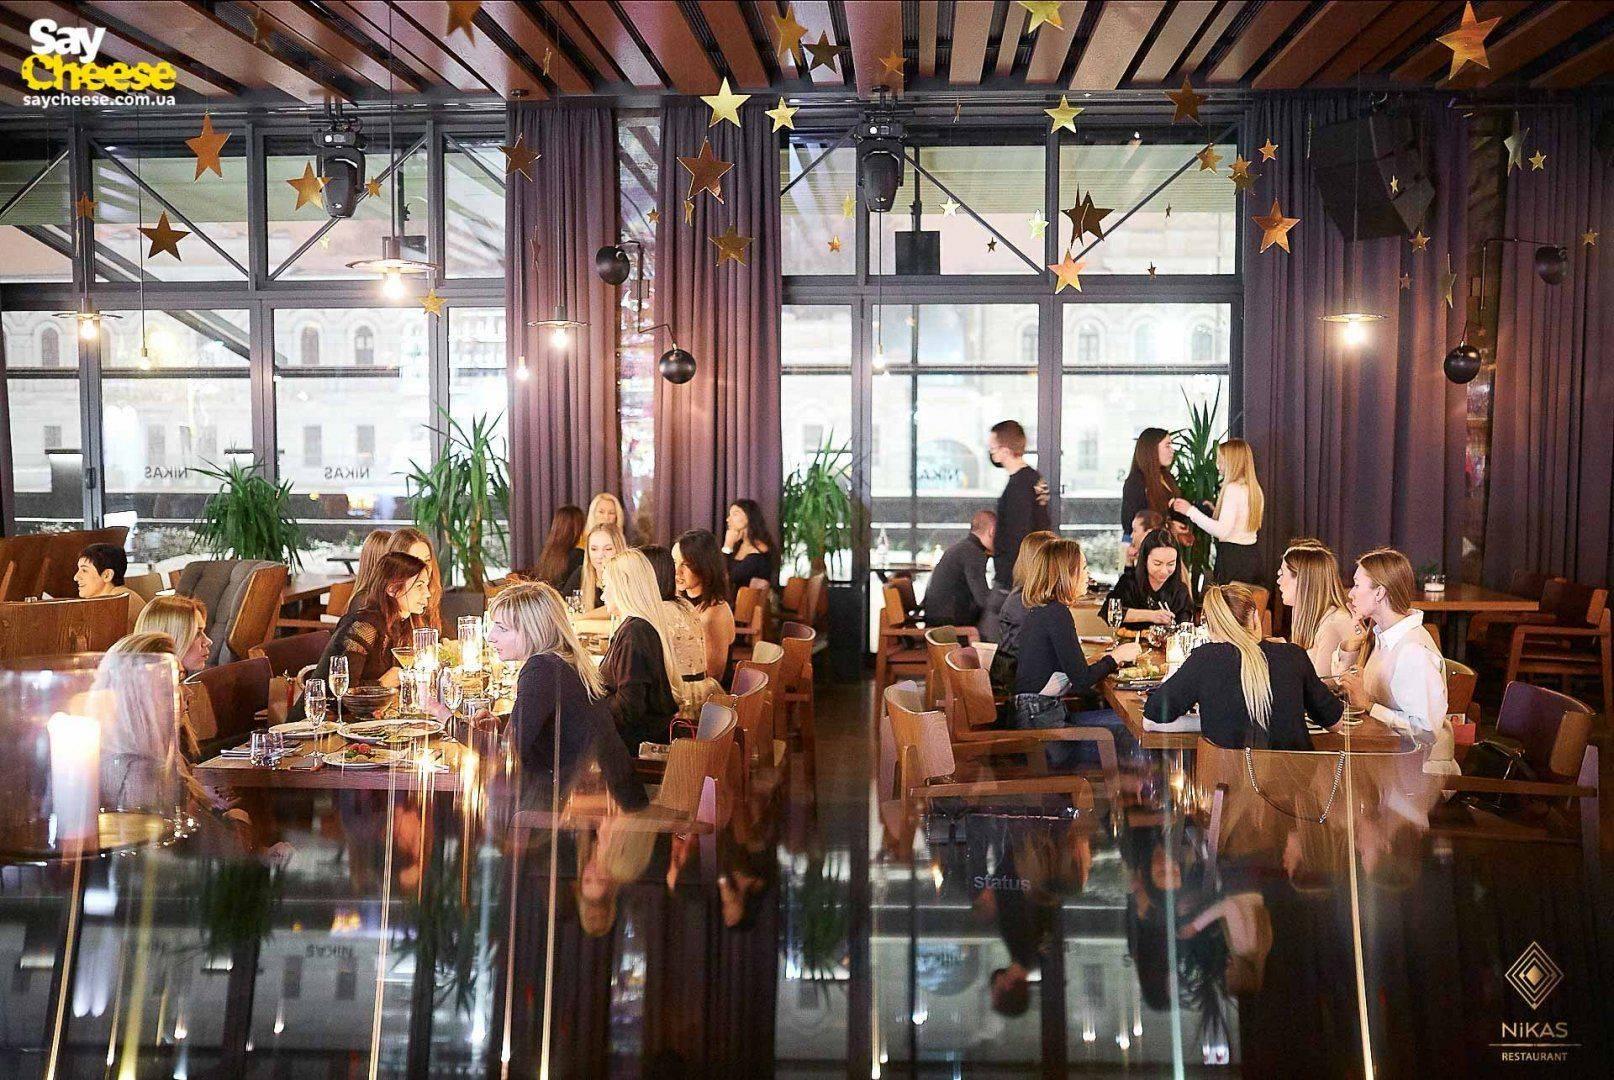 Ресторан Никас Харьков фотоотчет Saycheese 29.01